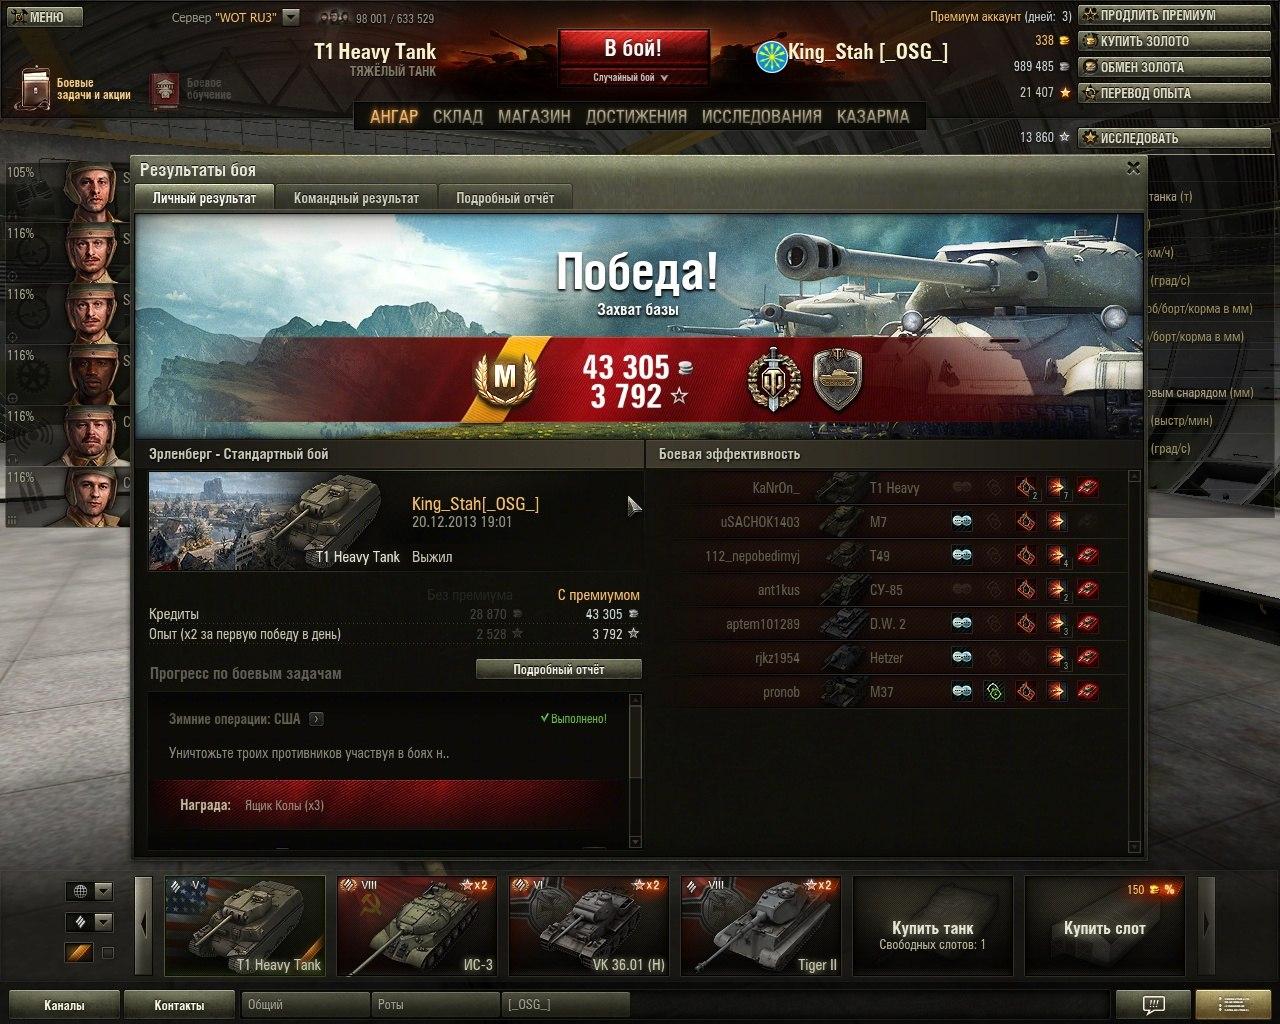 T1 Heavy Tank - Тяжелые танки - Официальный форум игры World of ...